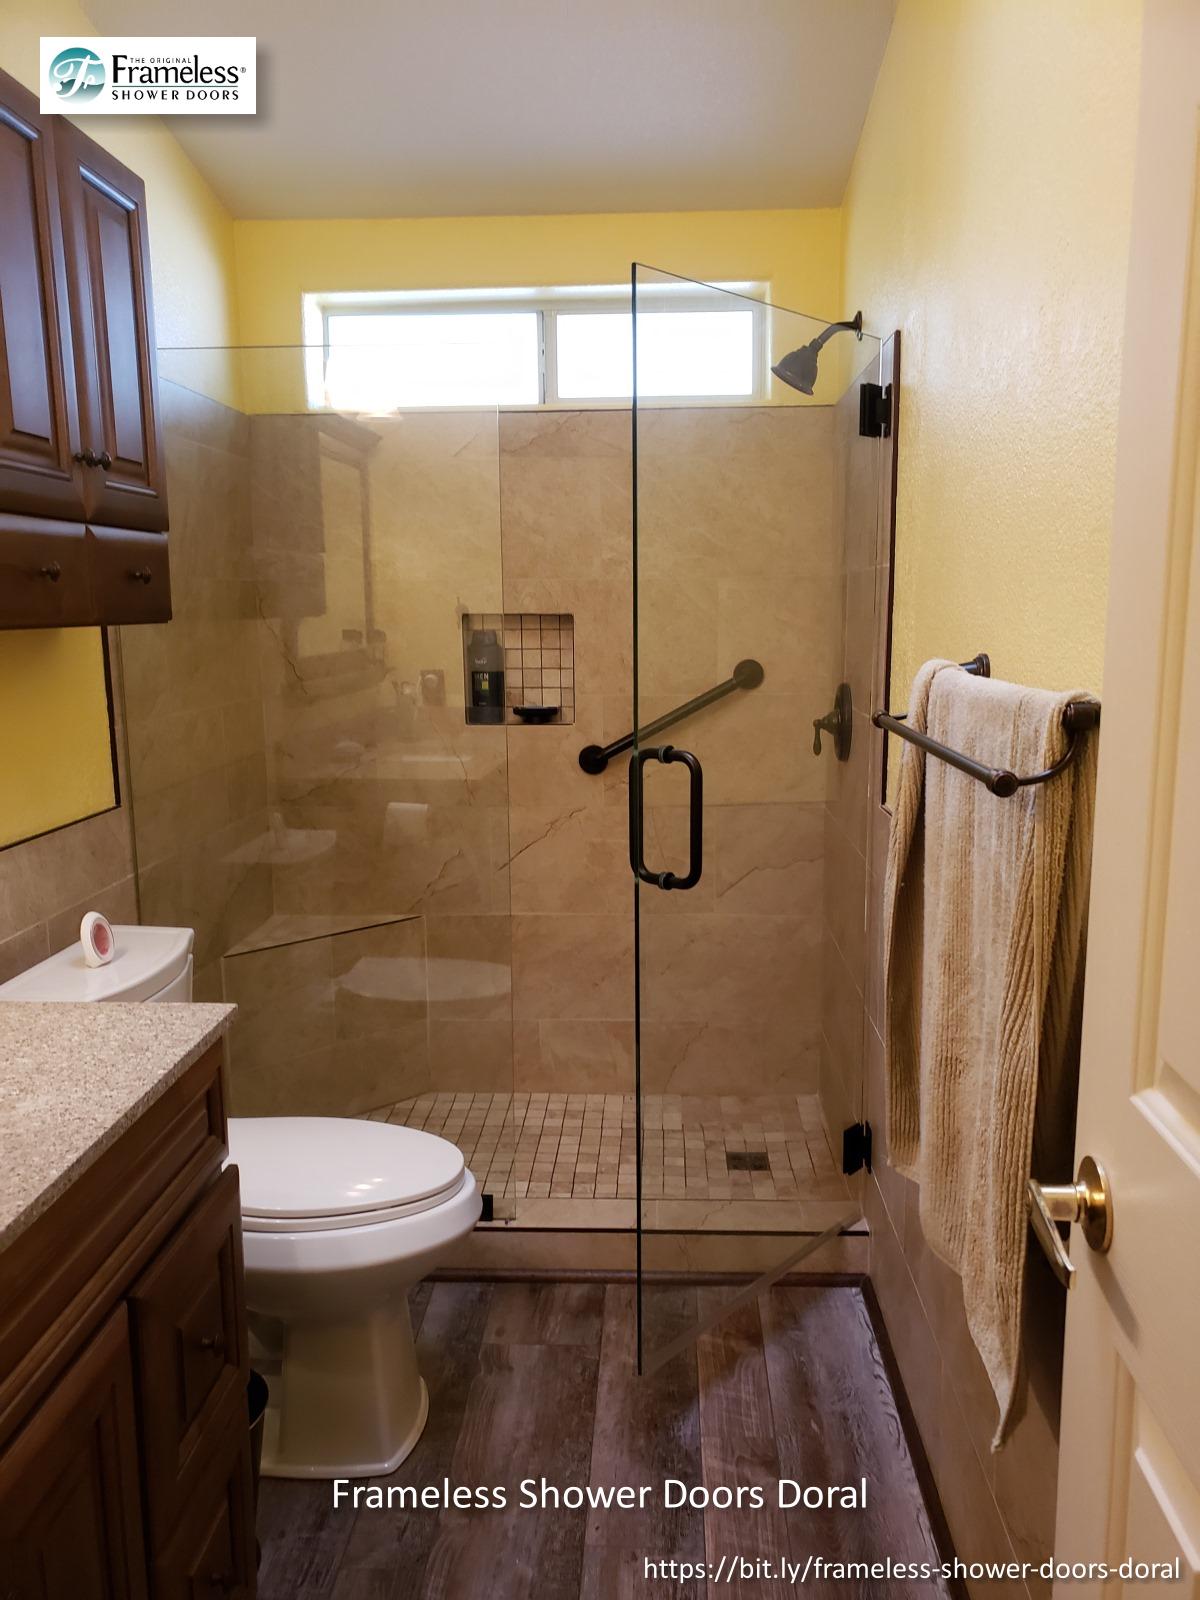 The Original Frameless Shower Doors Highlights the Benefits of Custom Shower Doors